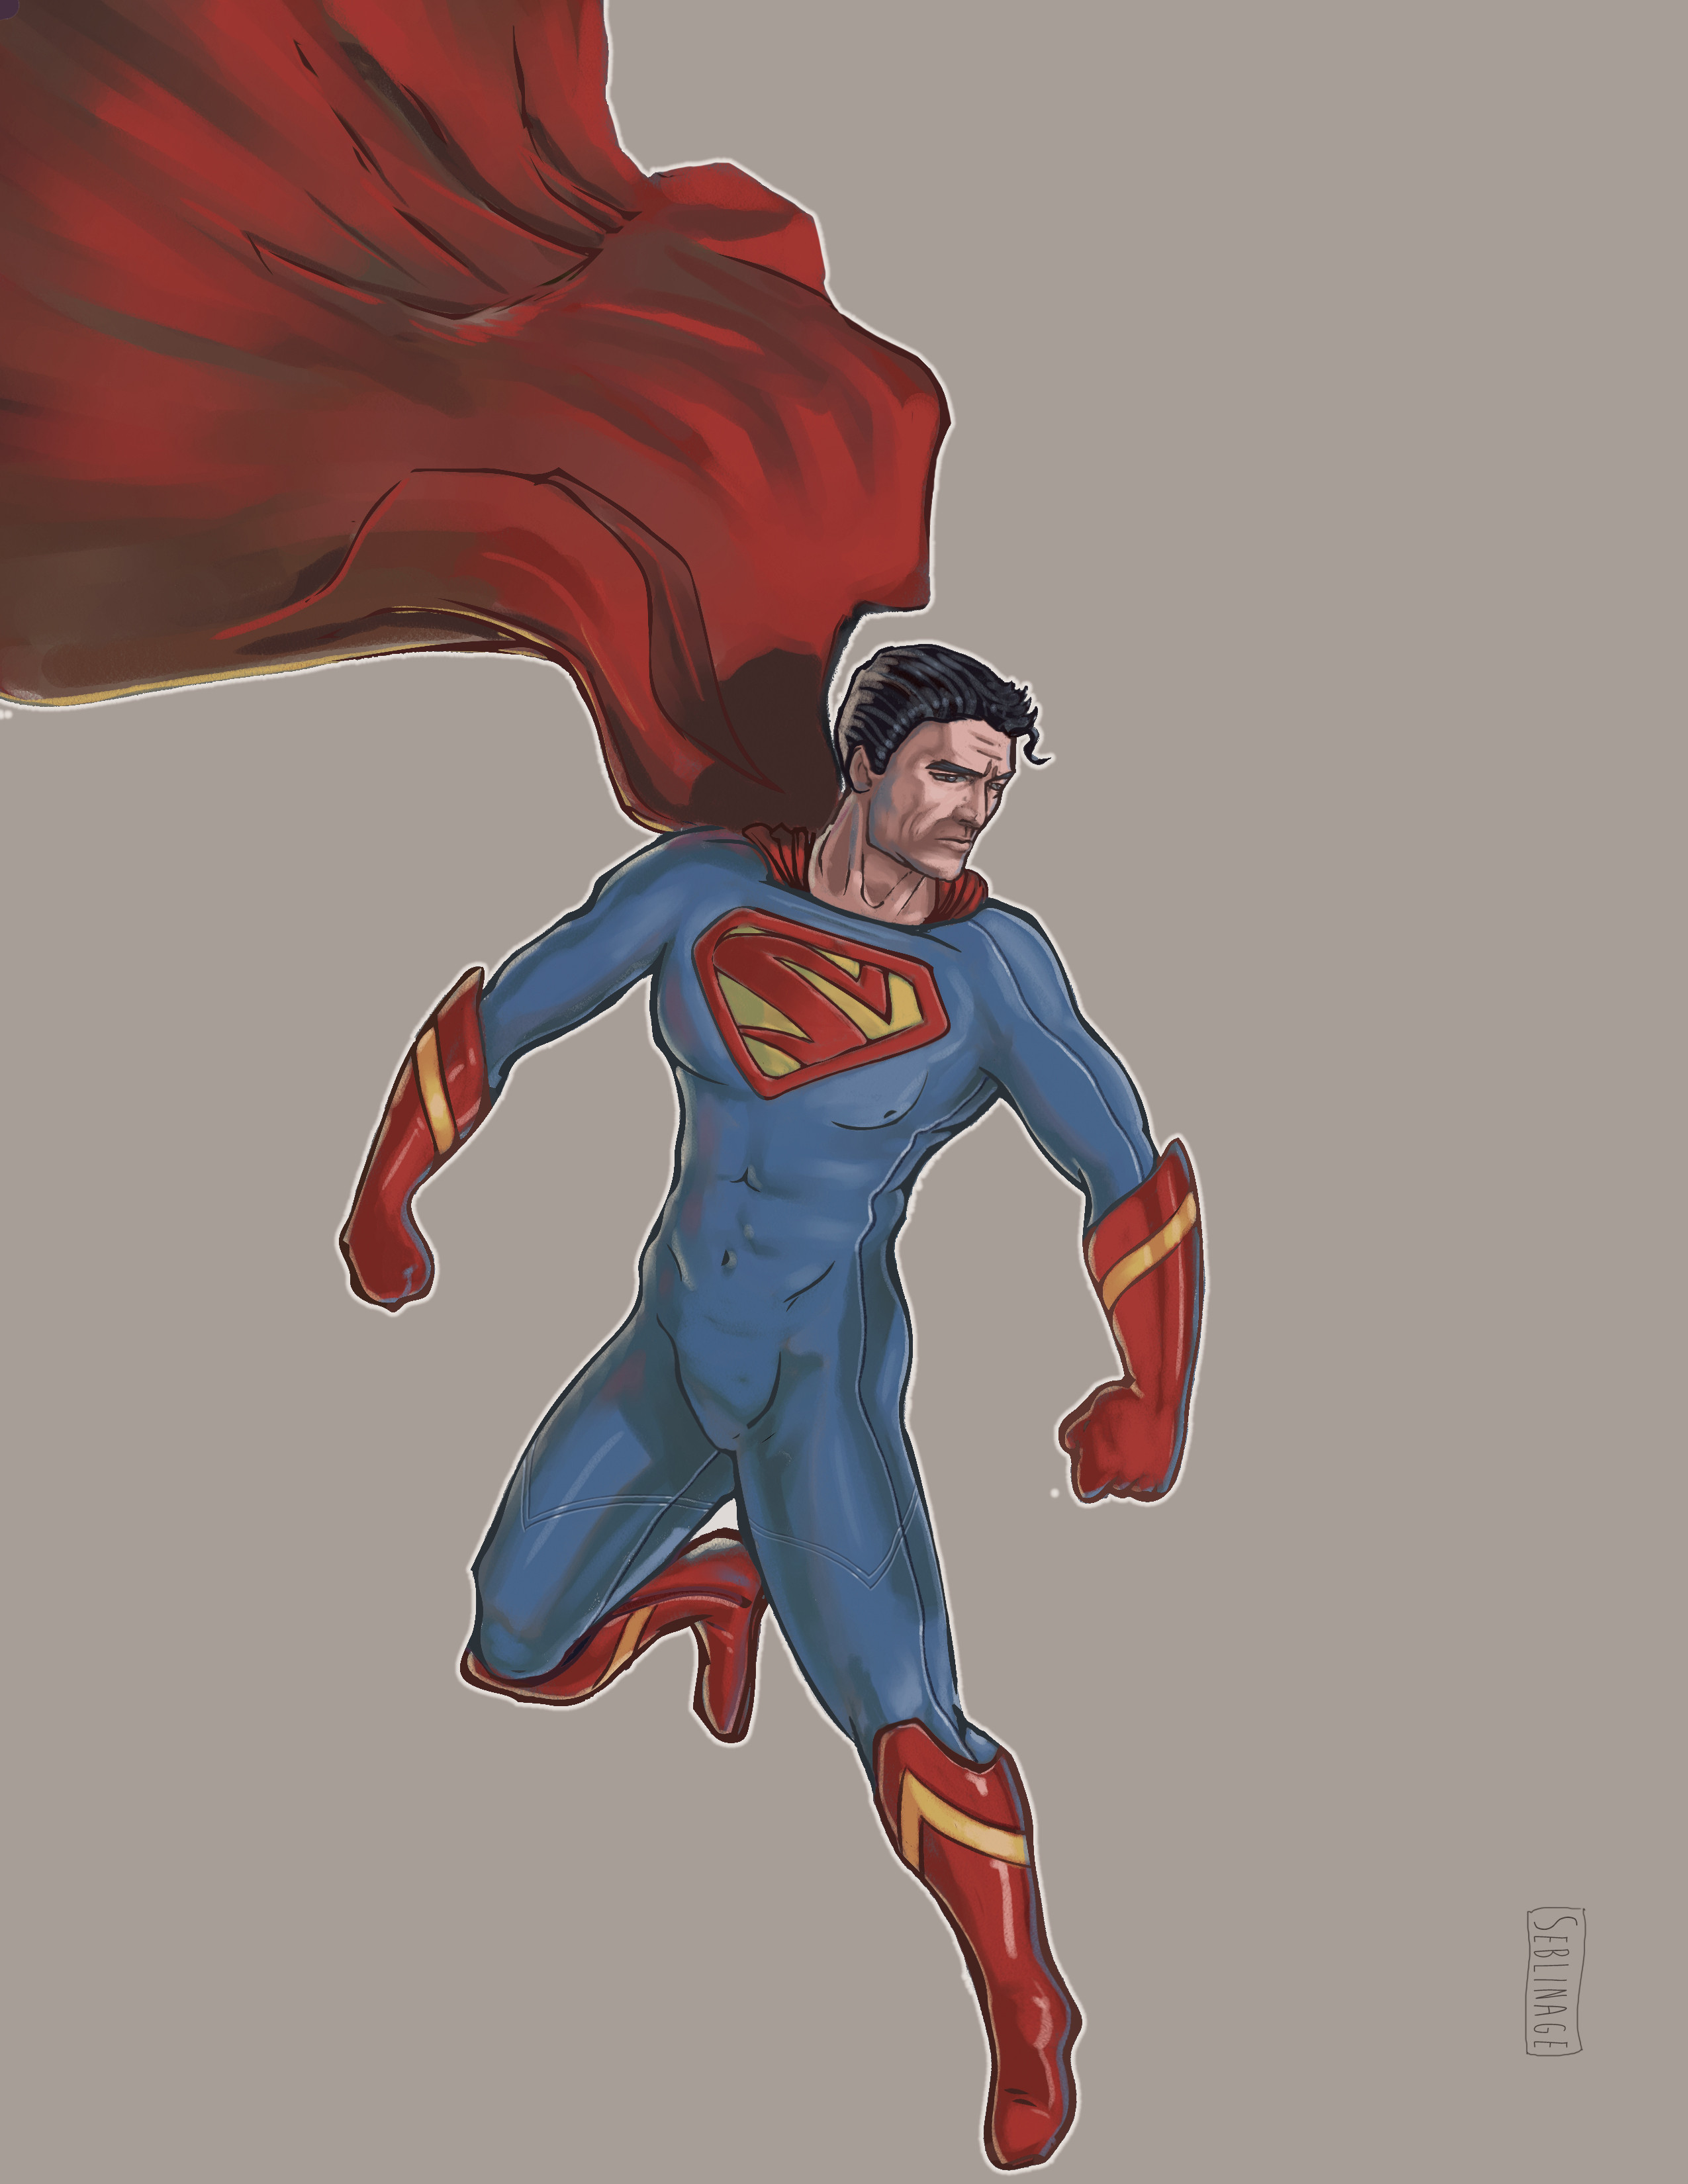 Superman costume variant. Pencil/Photoshop